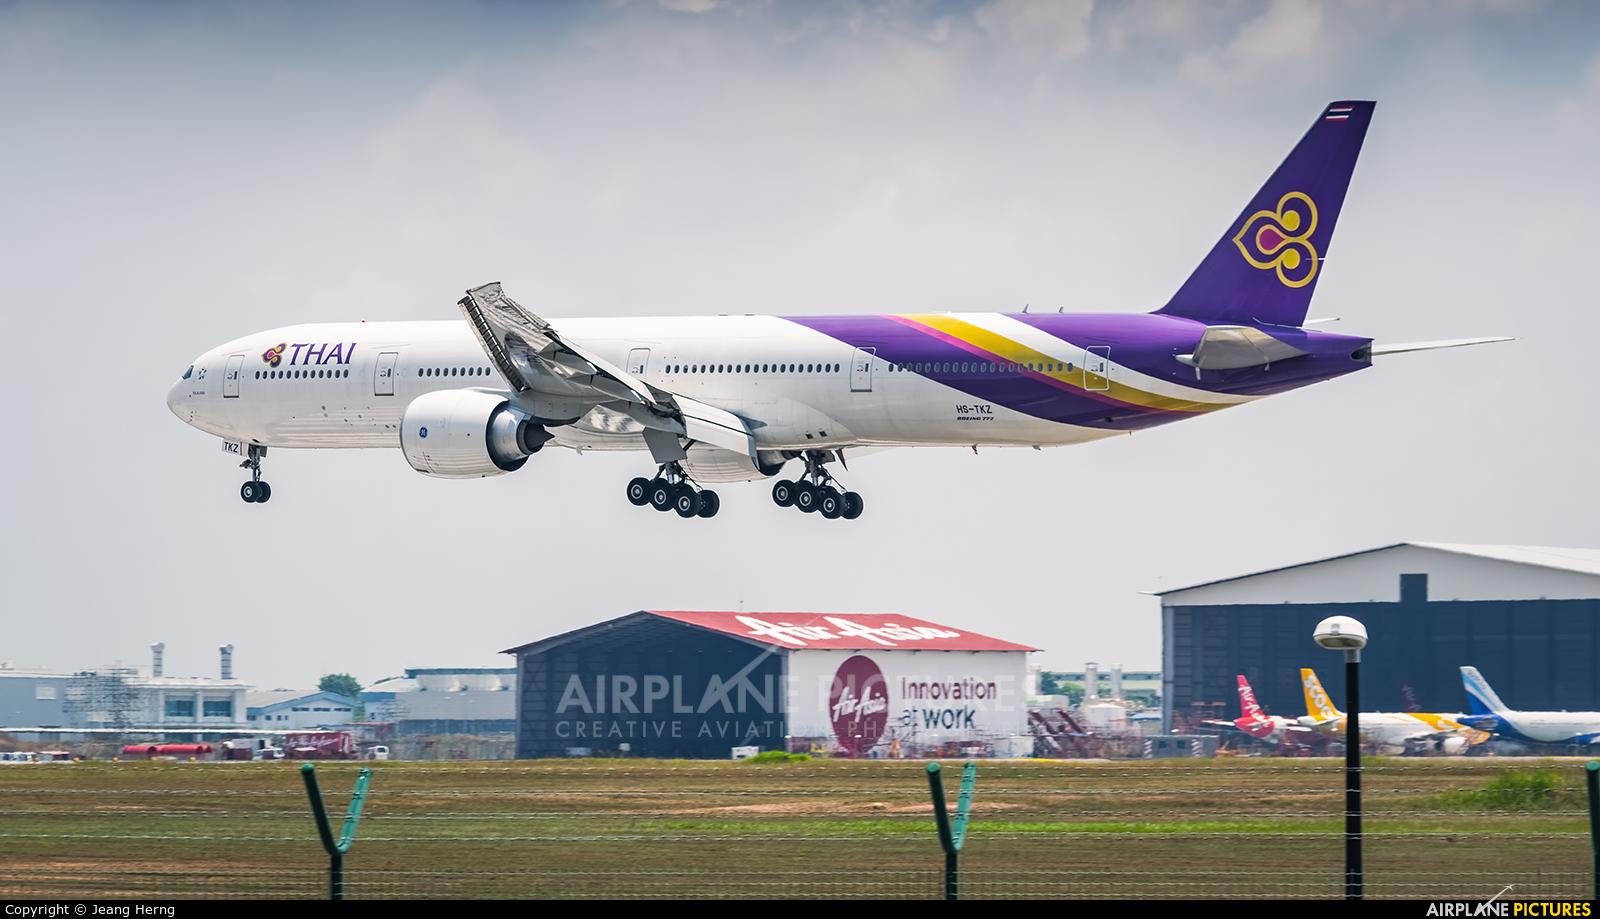 Thai Airways HS-TKZ aircraft at Kuala Lumpur Intl